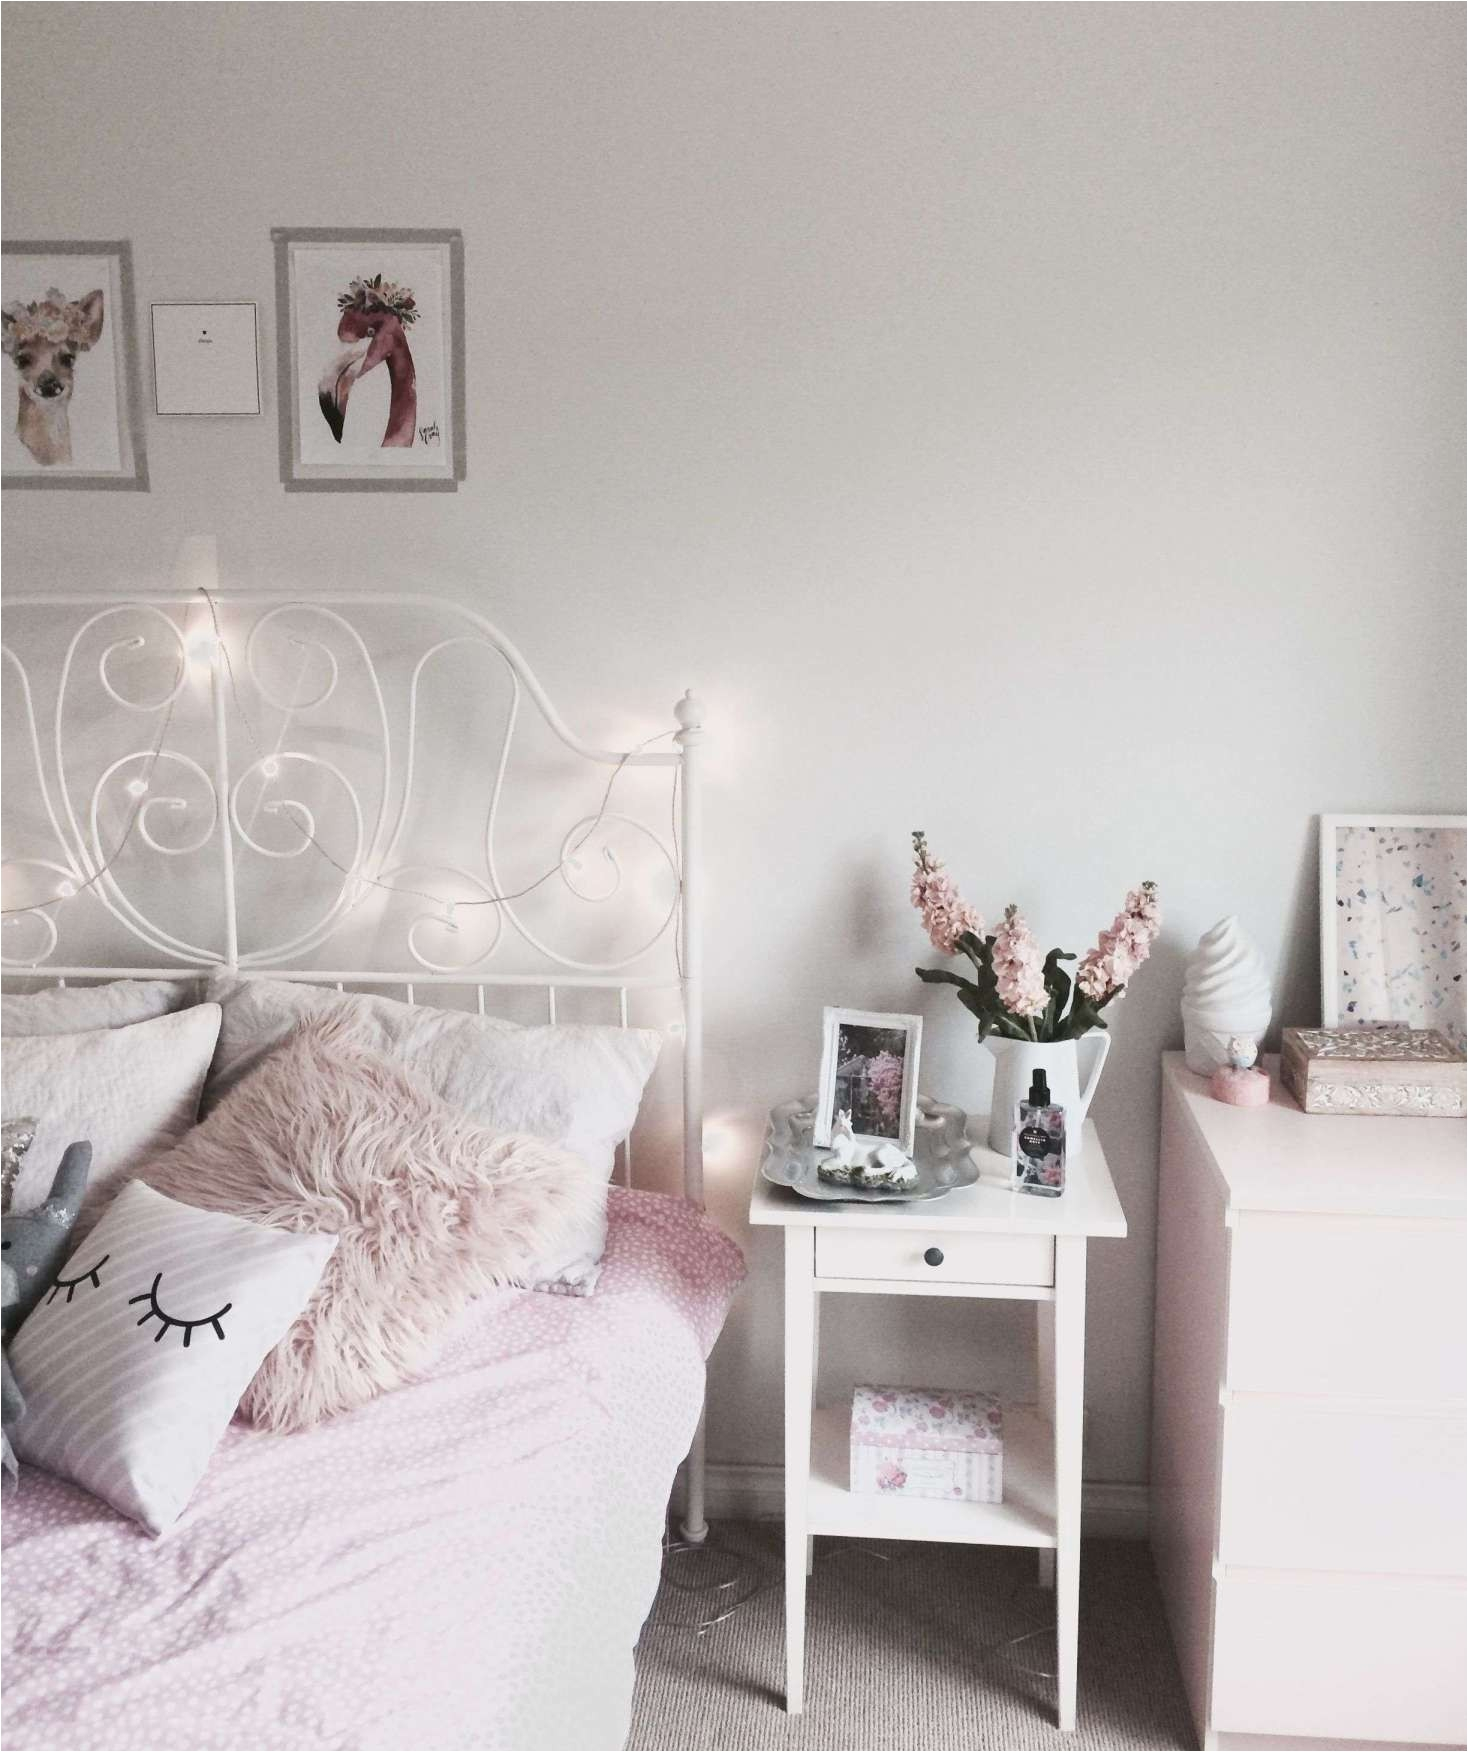 Bedroom Design for Teenage Girl Teenage Girl Bedroom Wall Decorating Ideas Epic Metal Wall Art